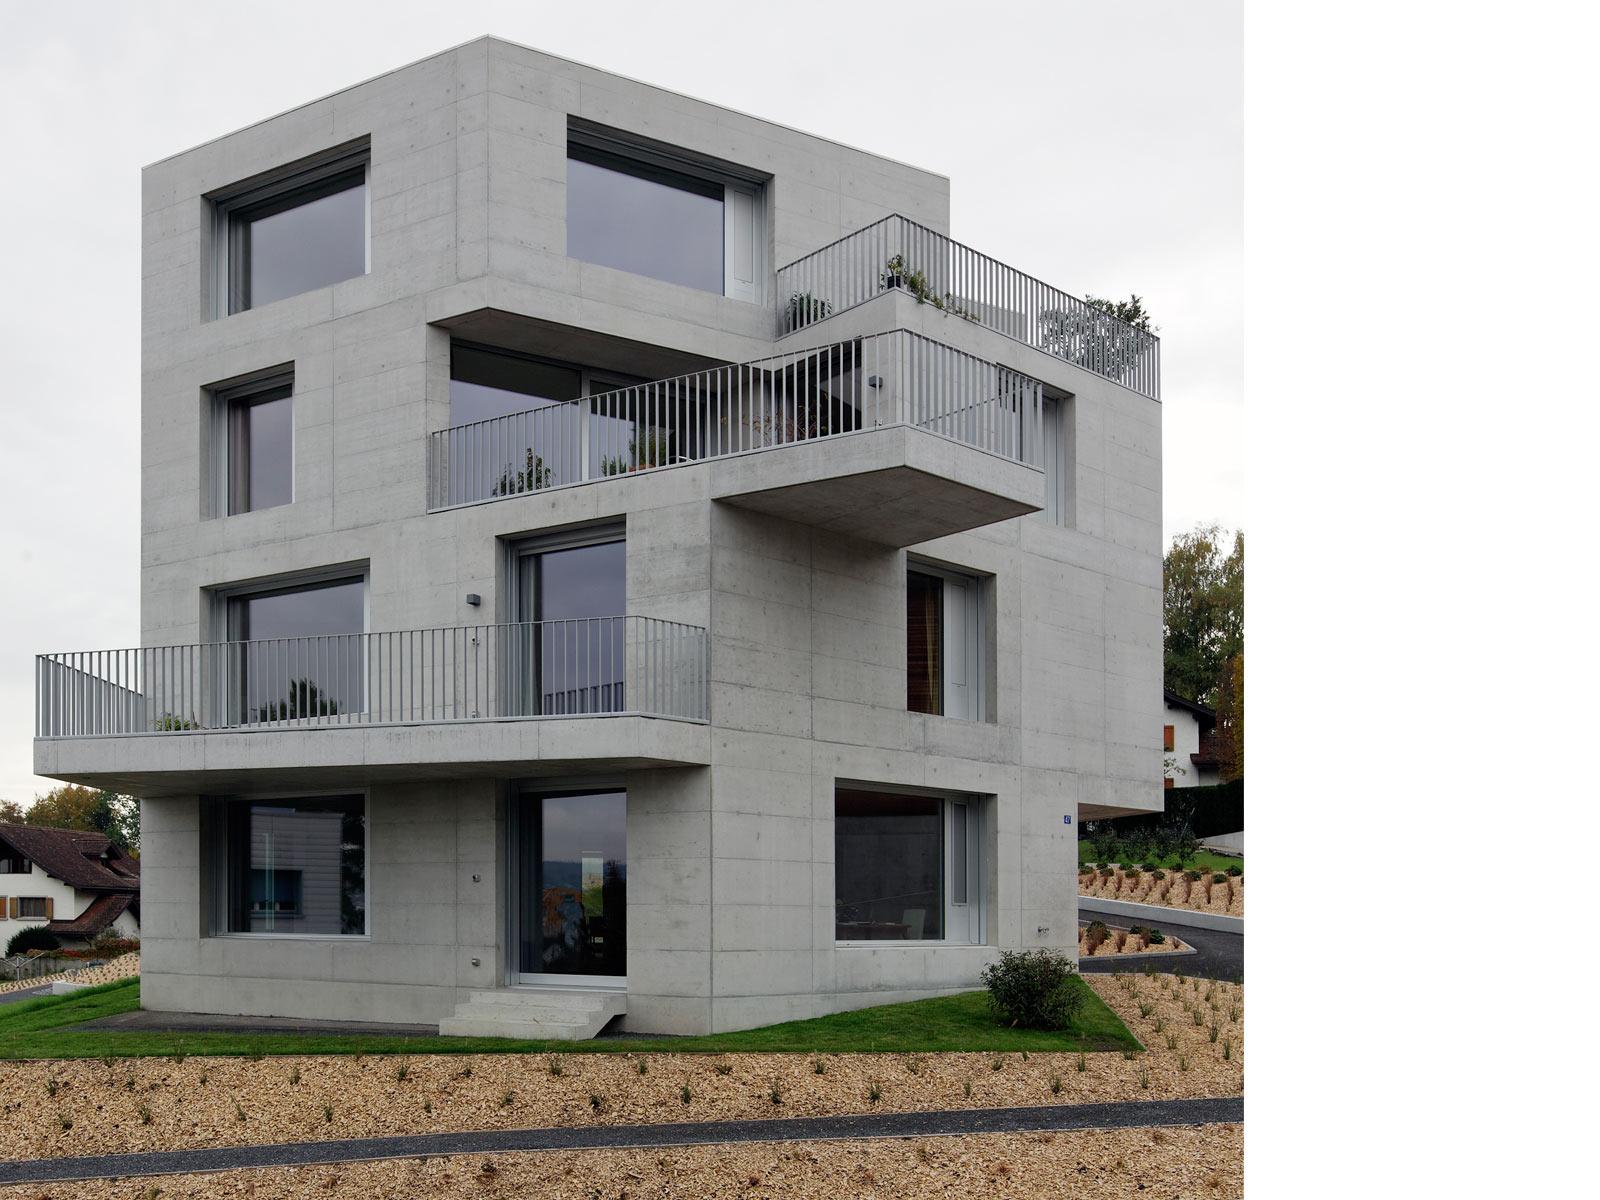 Best Architects Architektur Award Oliver Brandenberger Ag Oliver Brandenberger Ag